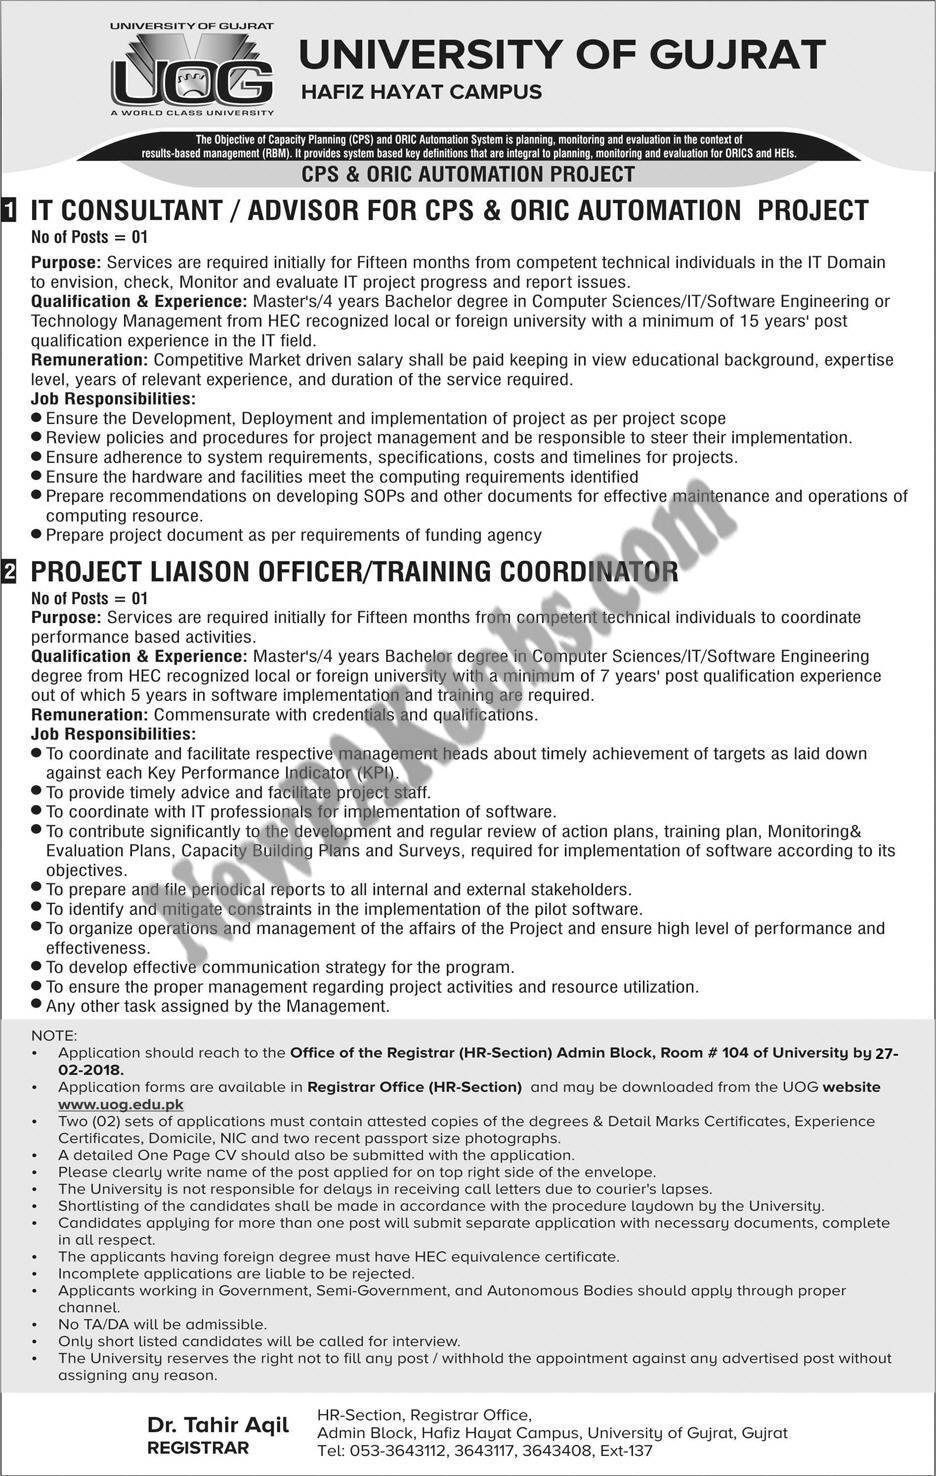 Latest Jobs in University of Gujrat, Hafiz Hayat Campus, 2018 New Govt Jobs Advertisements